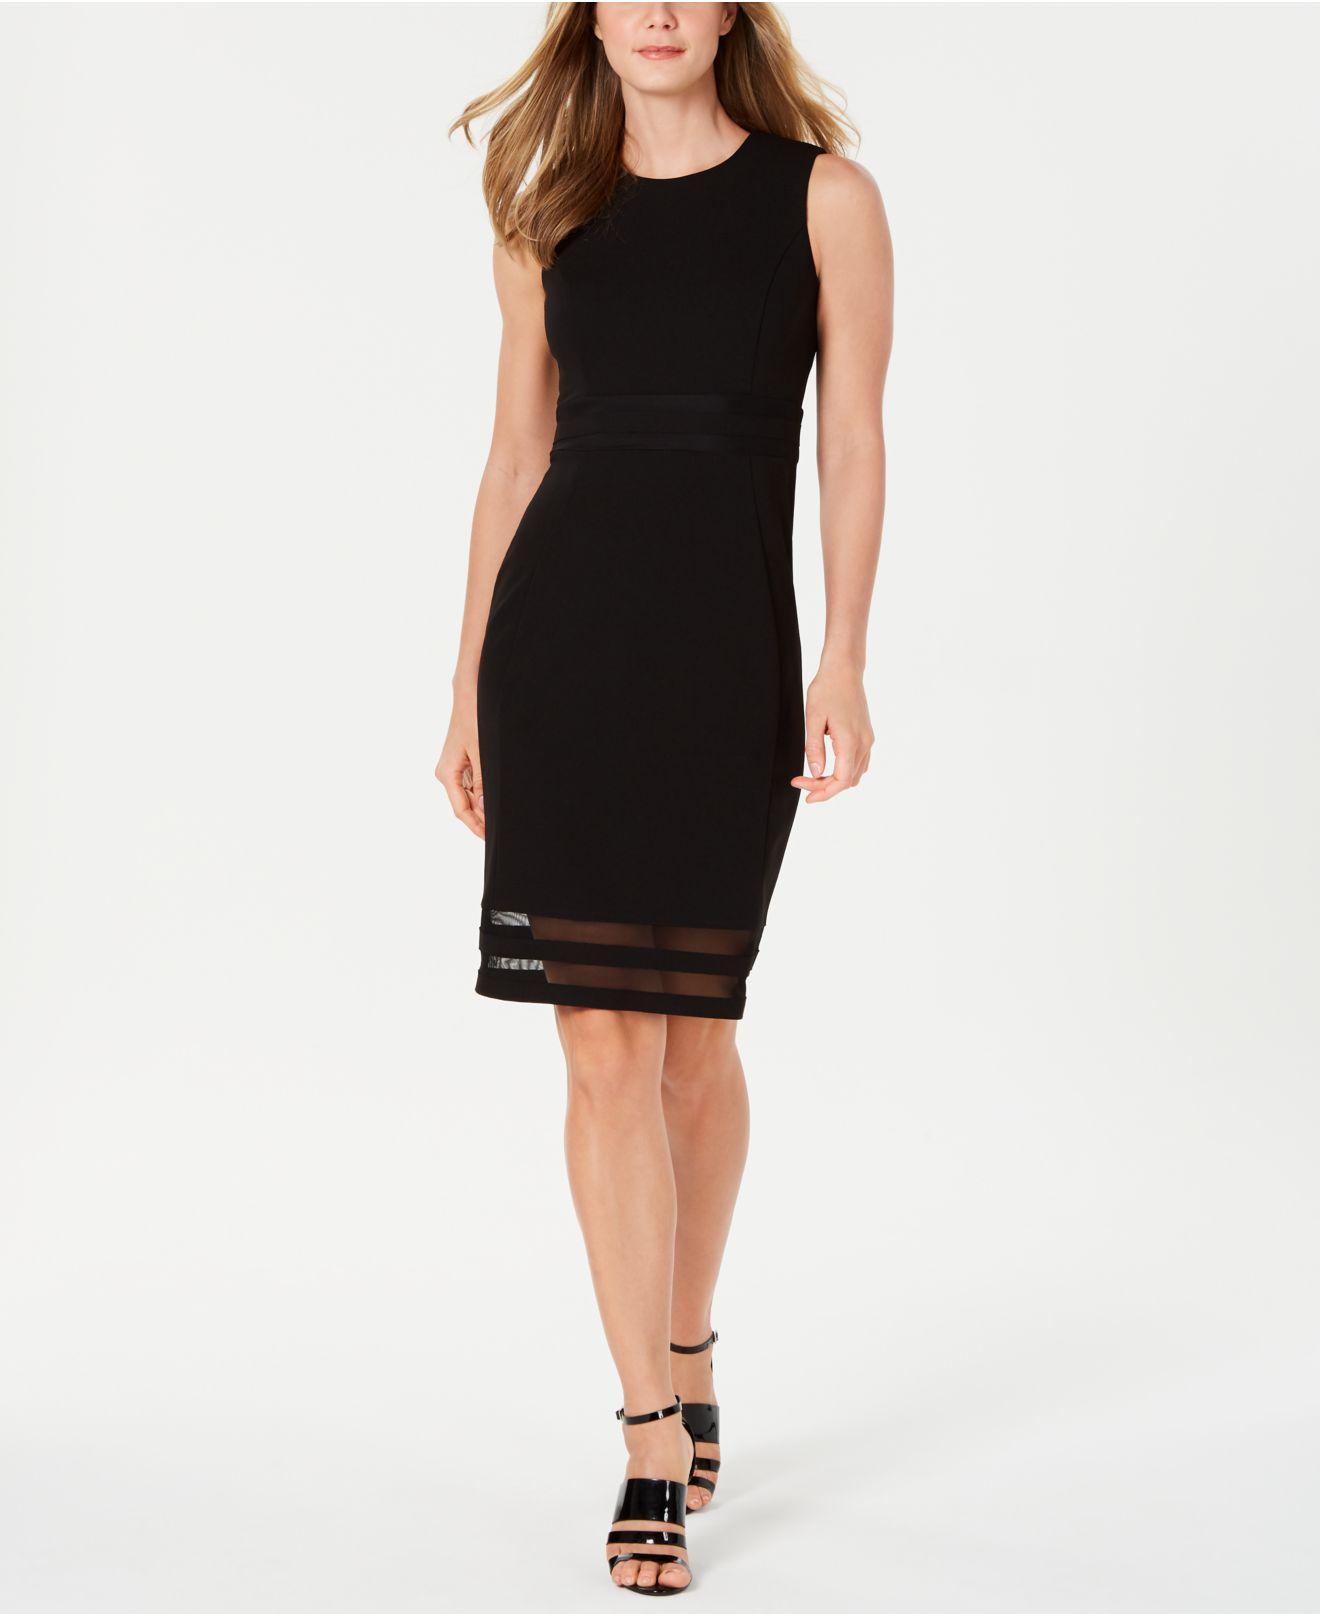 2df7c13156bd9 Lyst - Calvin Klein Illusion-hem Sheath Dress in Black